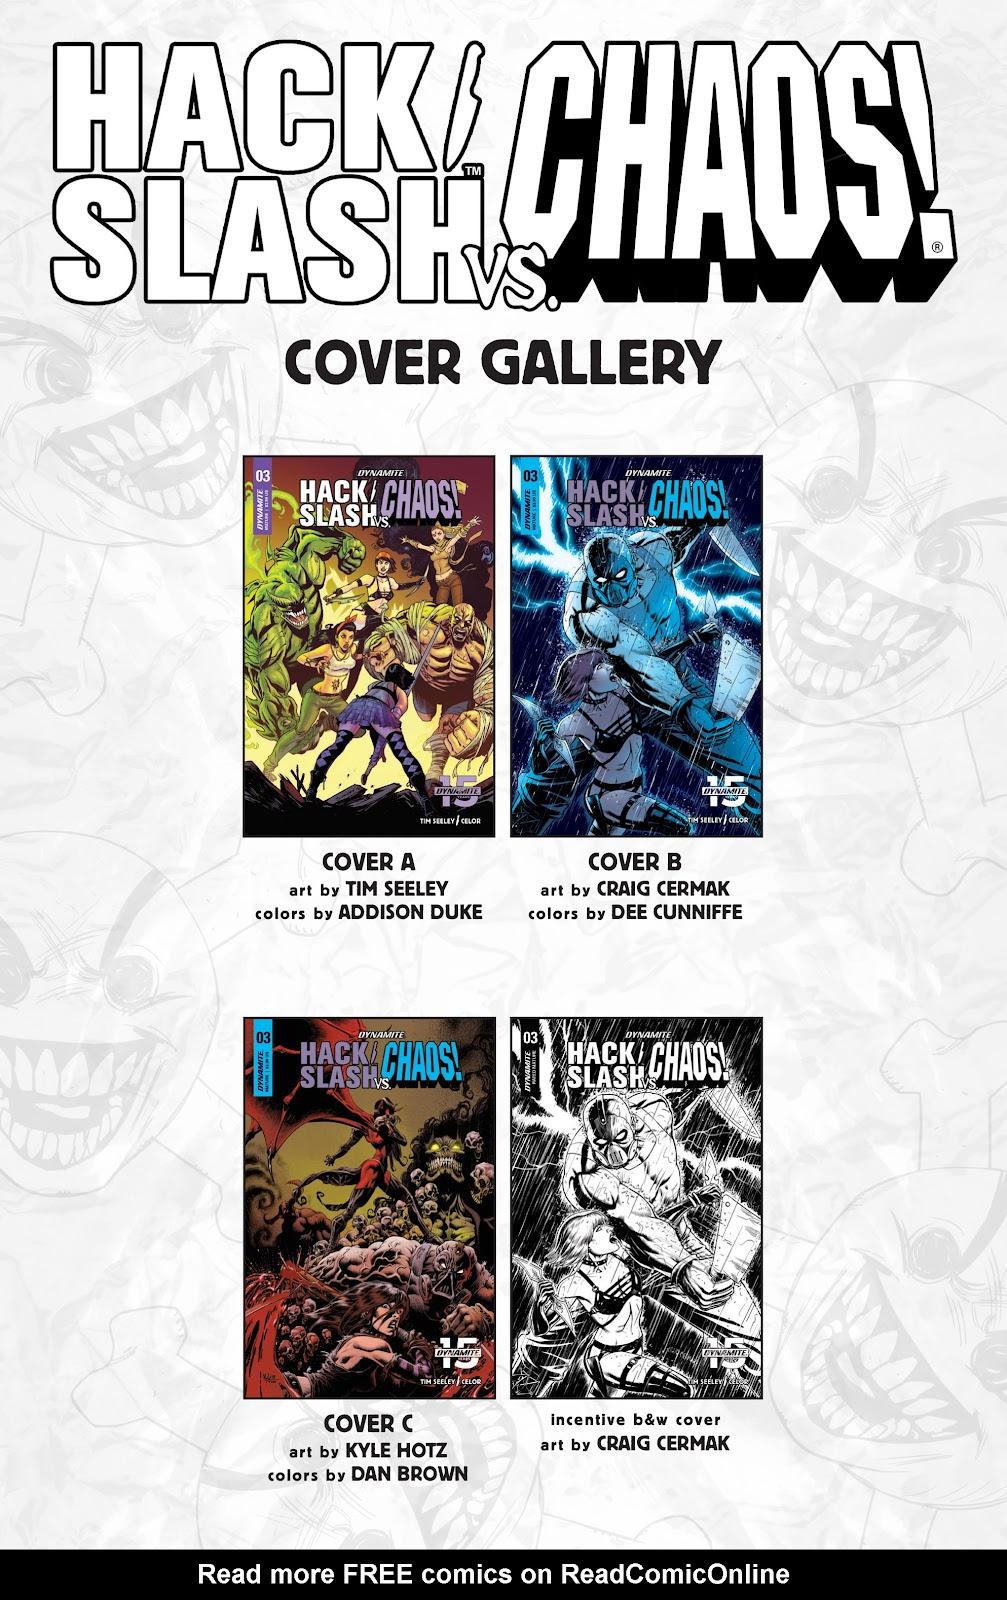 Read online Hack/Slash vs. Chaos comic -  Issue #3 - 27